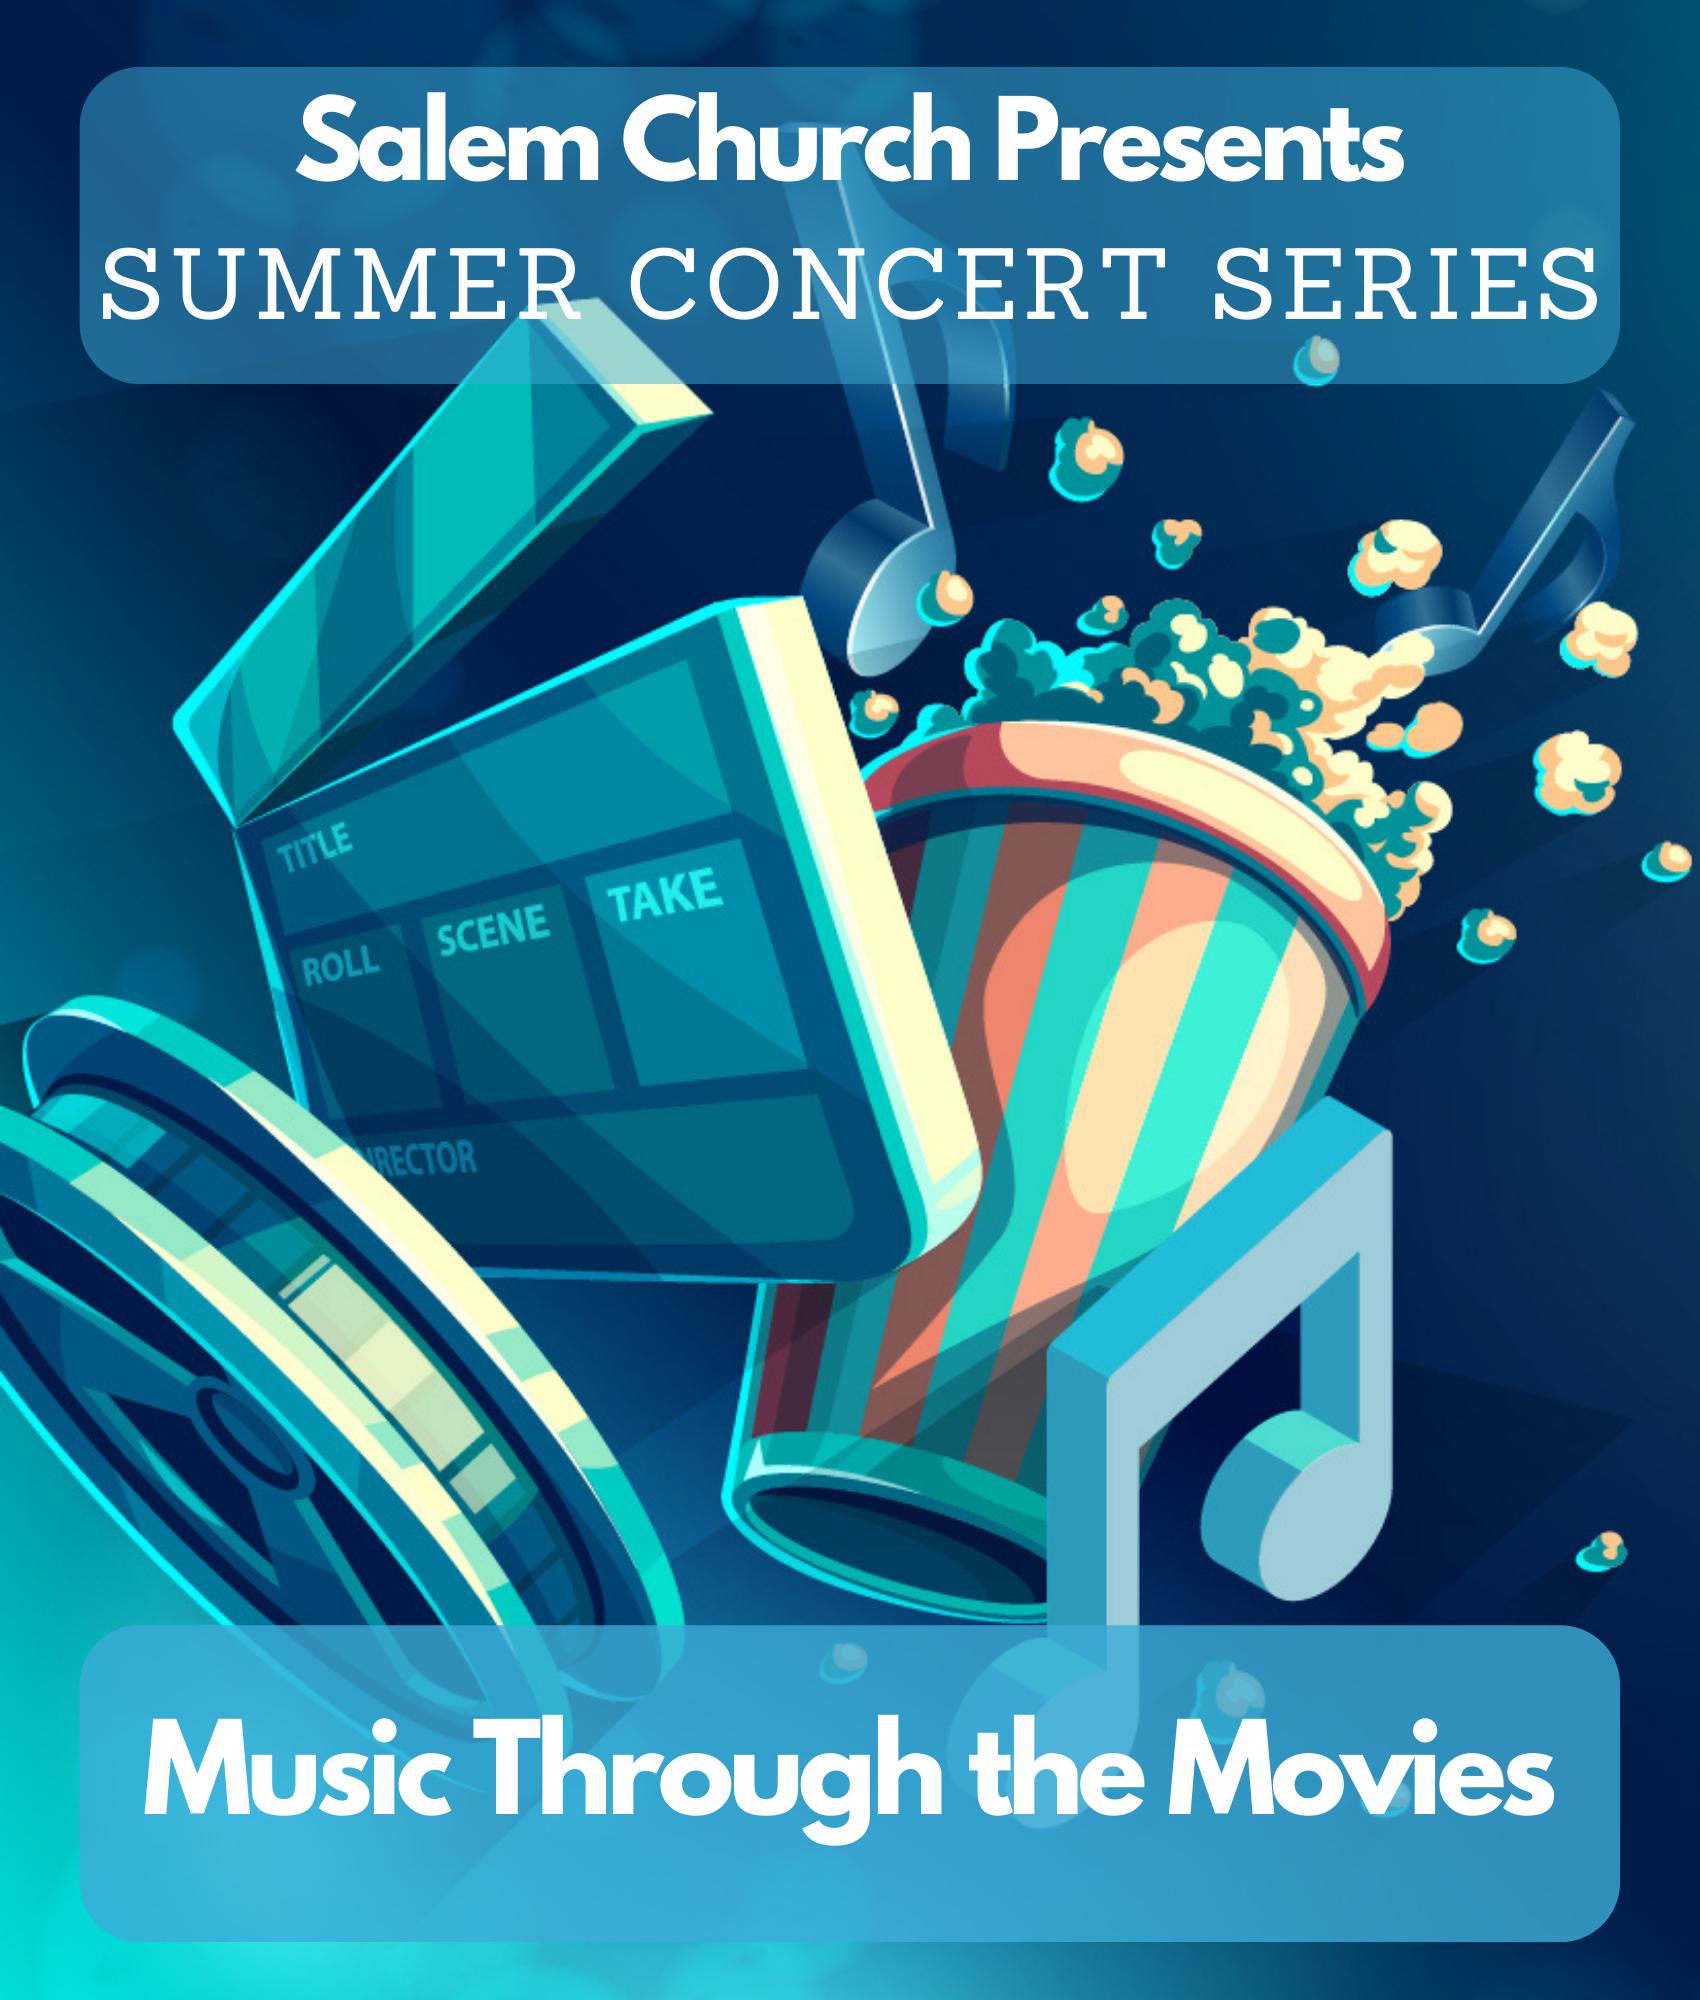 Music Through the Movies